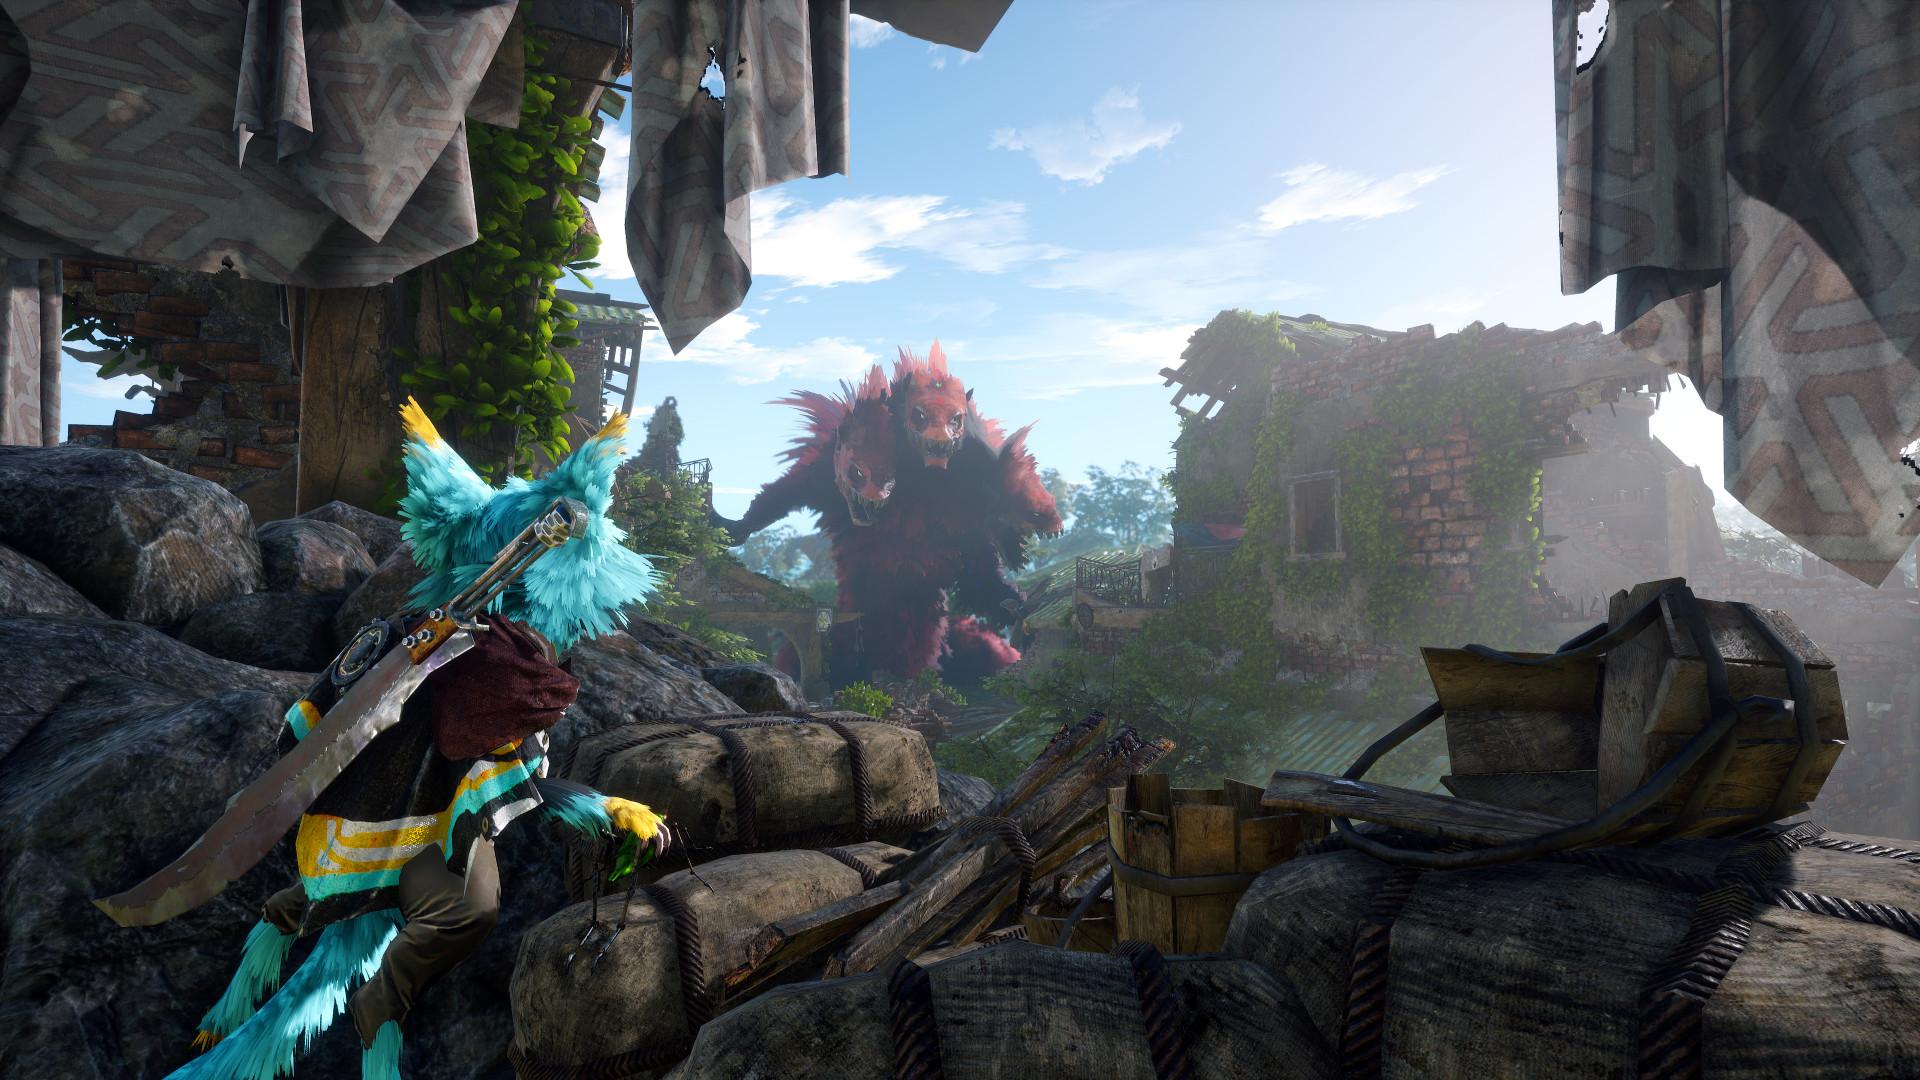 Разработчики Biomutant развеяли слухи об отмене игры